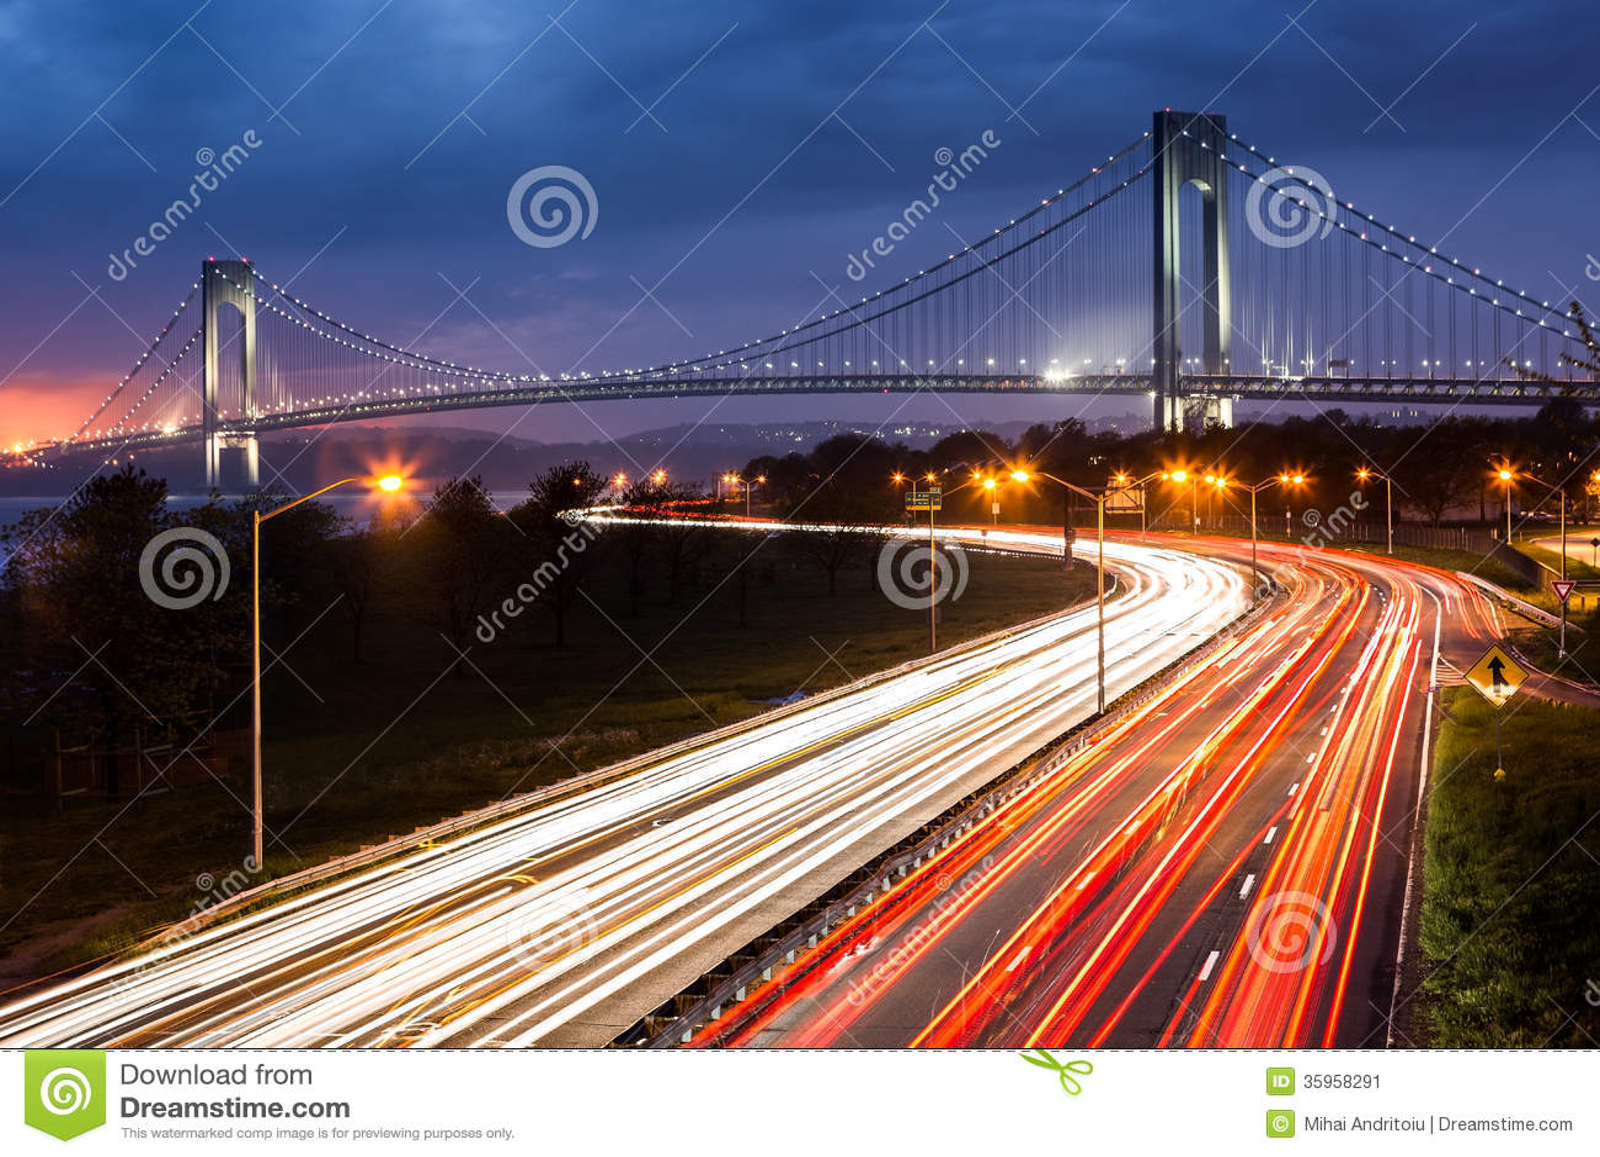 Verrazano Narrows Bridge above the light trails of the Belt Parkway traffic.